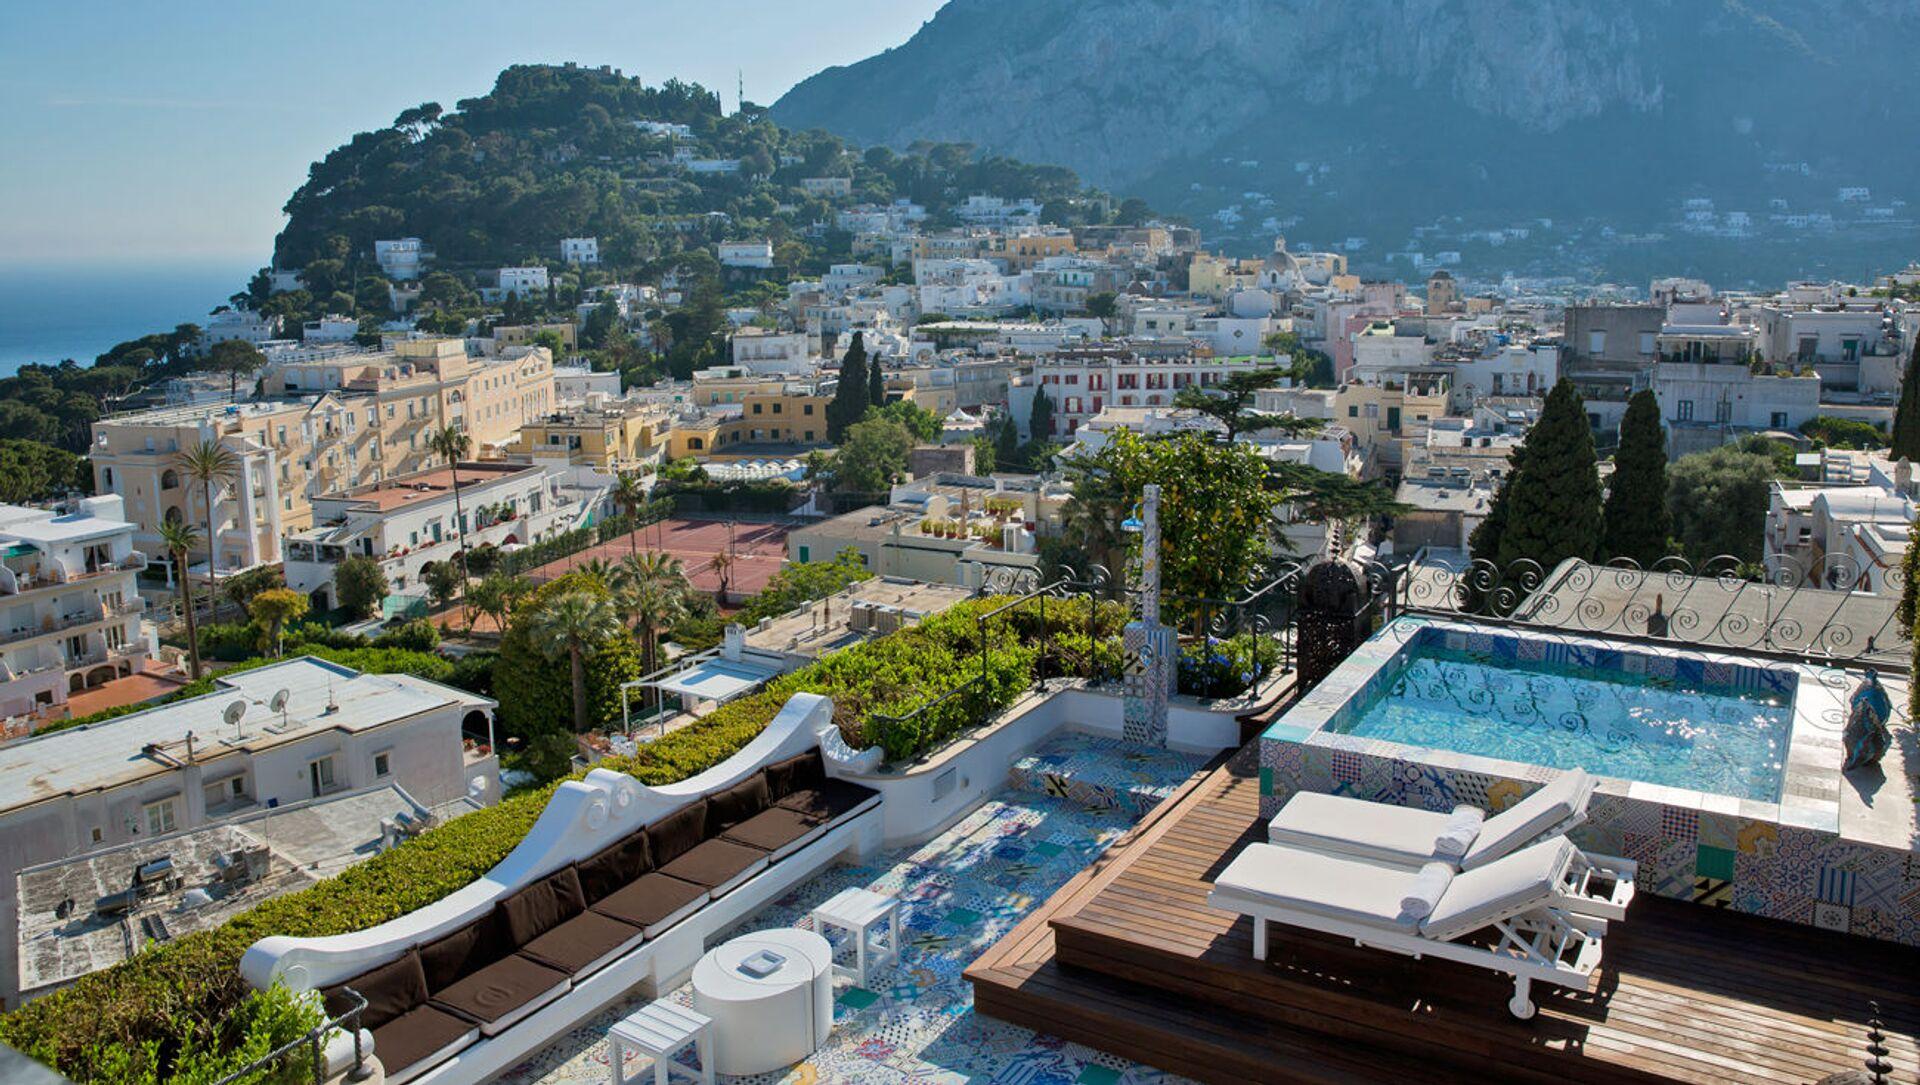 La vista dall'albergo Capri Tiberio Palace a Capri, Italia. - Sputnik Italia, 1920, 08.05.2021